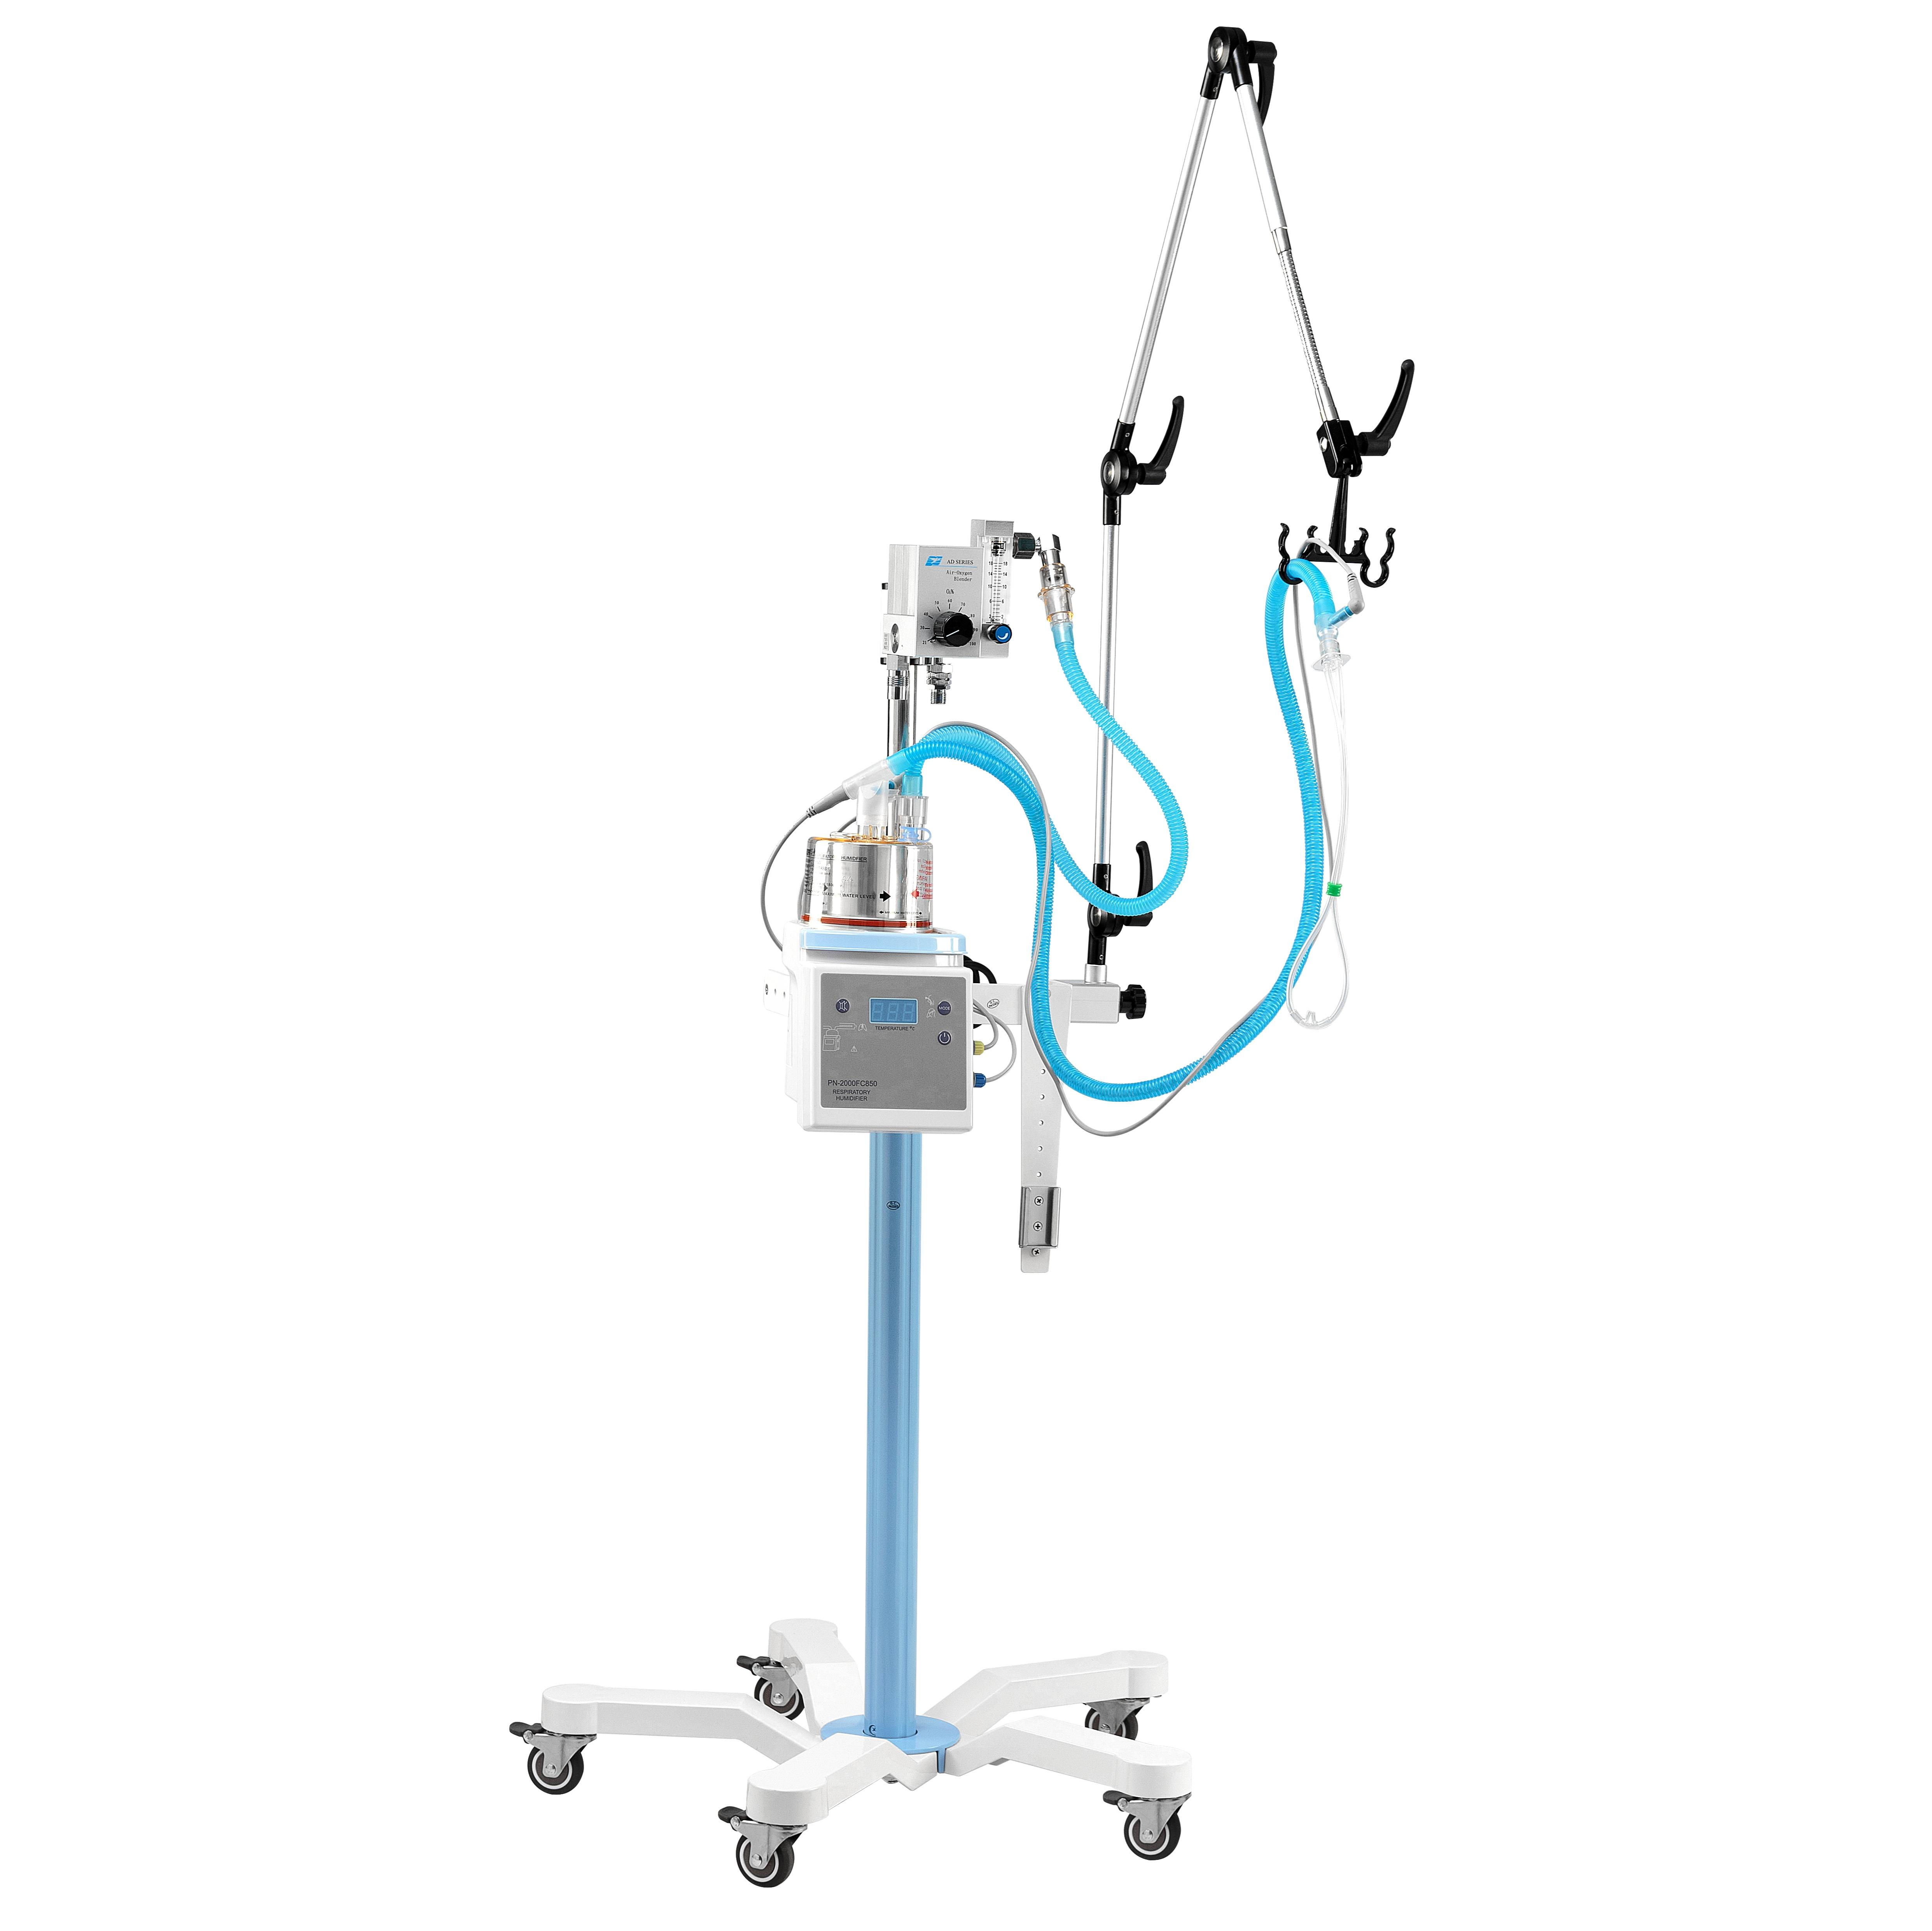 Adult hfnc oxygen high flow nasal cannula - KingCare | KingCare.net